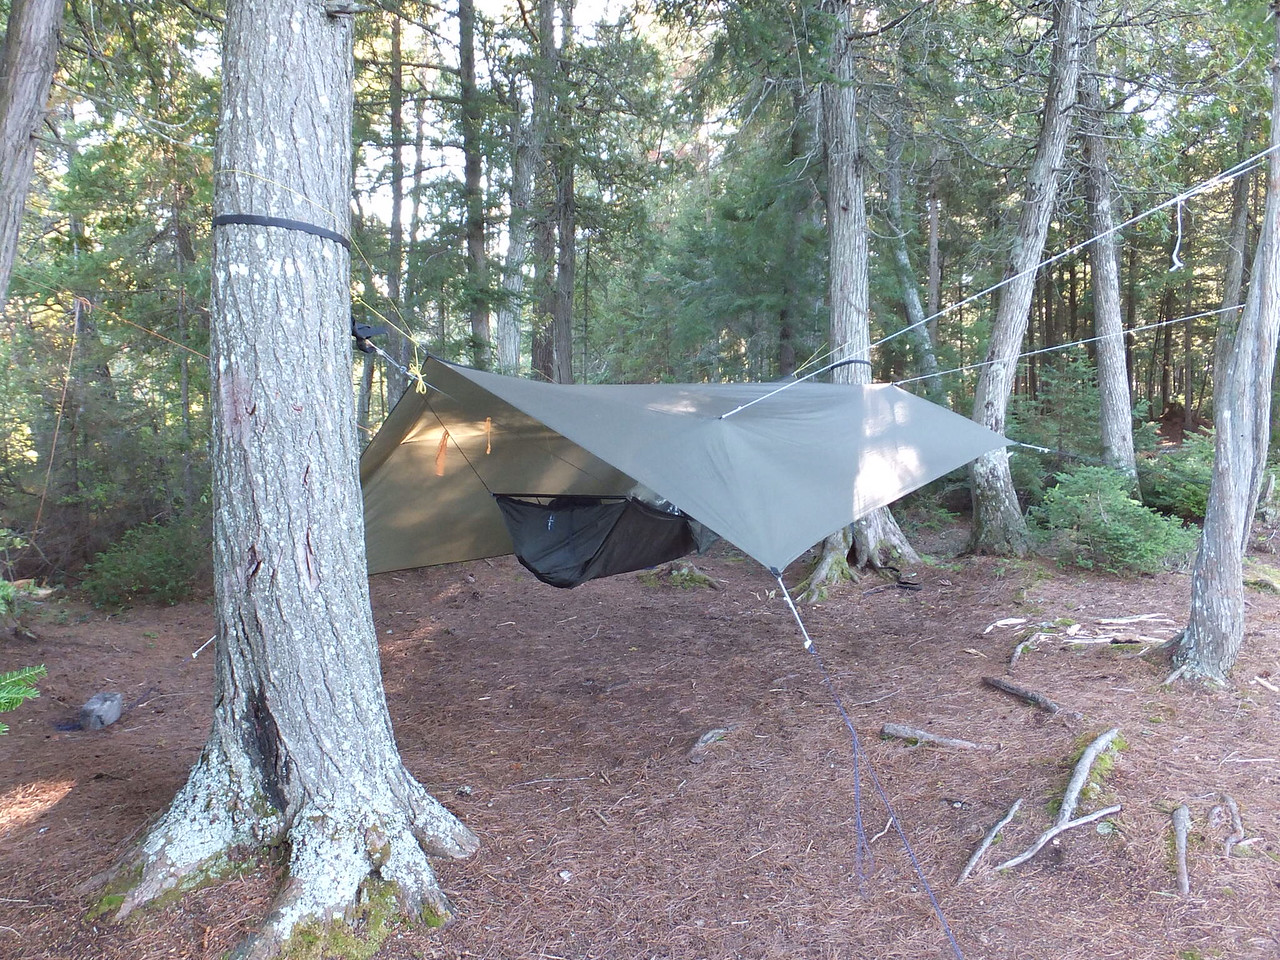 Another tarp and hammock photo